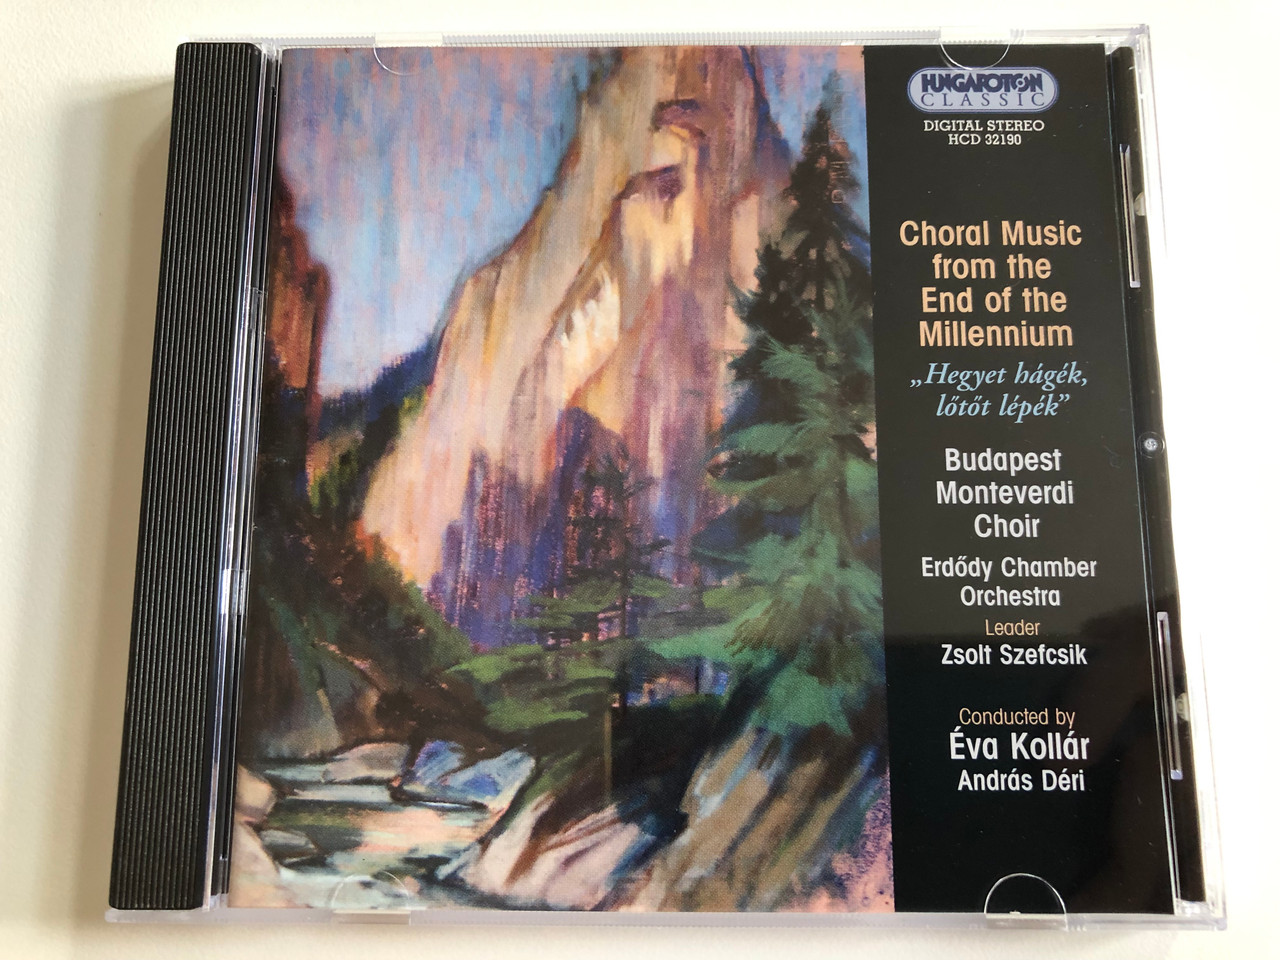 https://cdn10.bigcommerce.com/s-62bdpkt7pb/products/0/images/188448/Choral_Music_from_the_End_of_the_Milennium_-_Hegyet_hagek_lotot_lepek_Budapest_Monteverdi_Choir_Erdody_Chamber_Orchestra_Leader_Zsolt_Szefcsik_Conducted_by_Eva_Kollar_Andras_Deri_H_1__97358.1629473907.1280.1280.JPG?c=2&_gl=1*o7p7c2*_ga*MjA2NTIxMjE2MC4xNTkwNTEyNTMy*_ga_WS2VZYPC6G*MTYyOTQ2MzgxOC40MC4xLjE2Mjk0NzM5NTYuNjA.